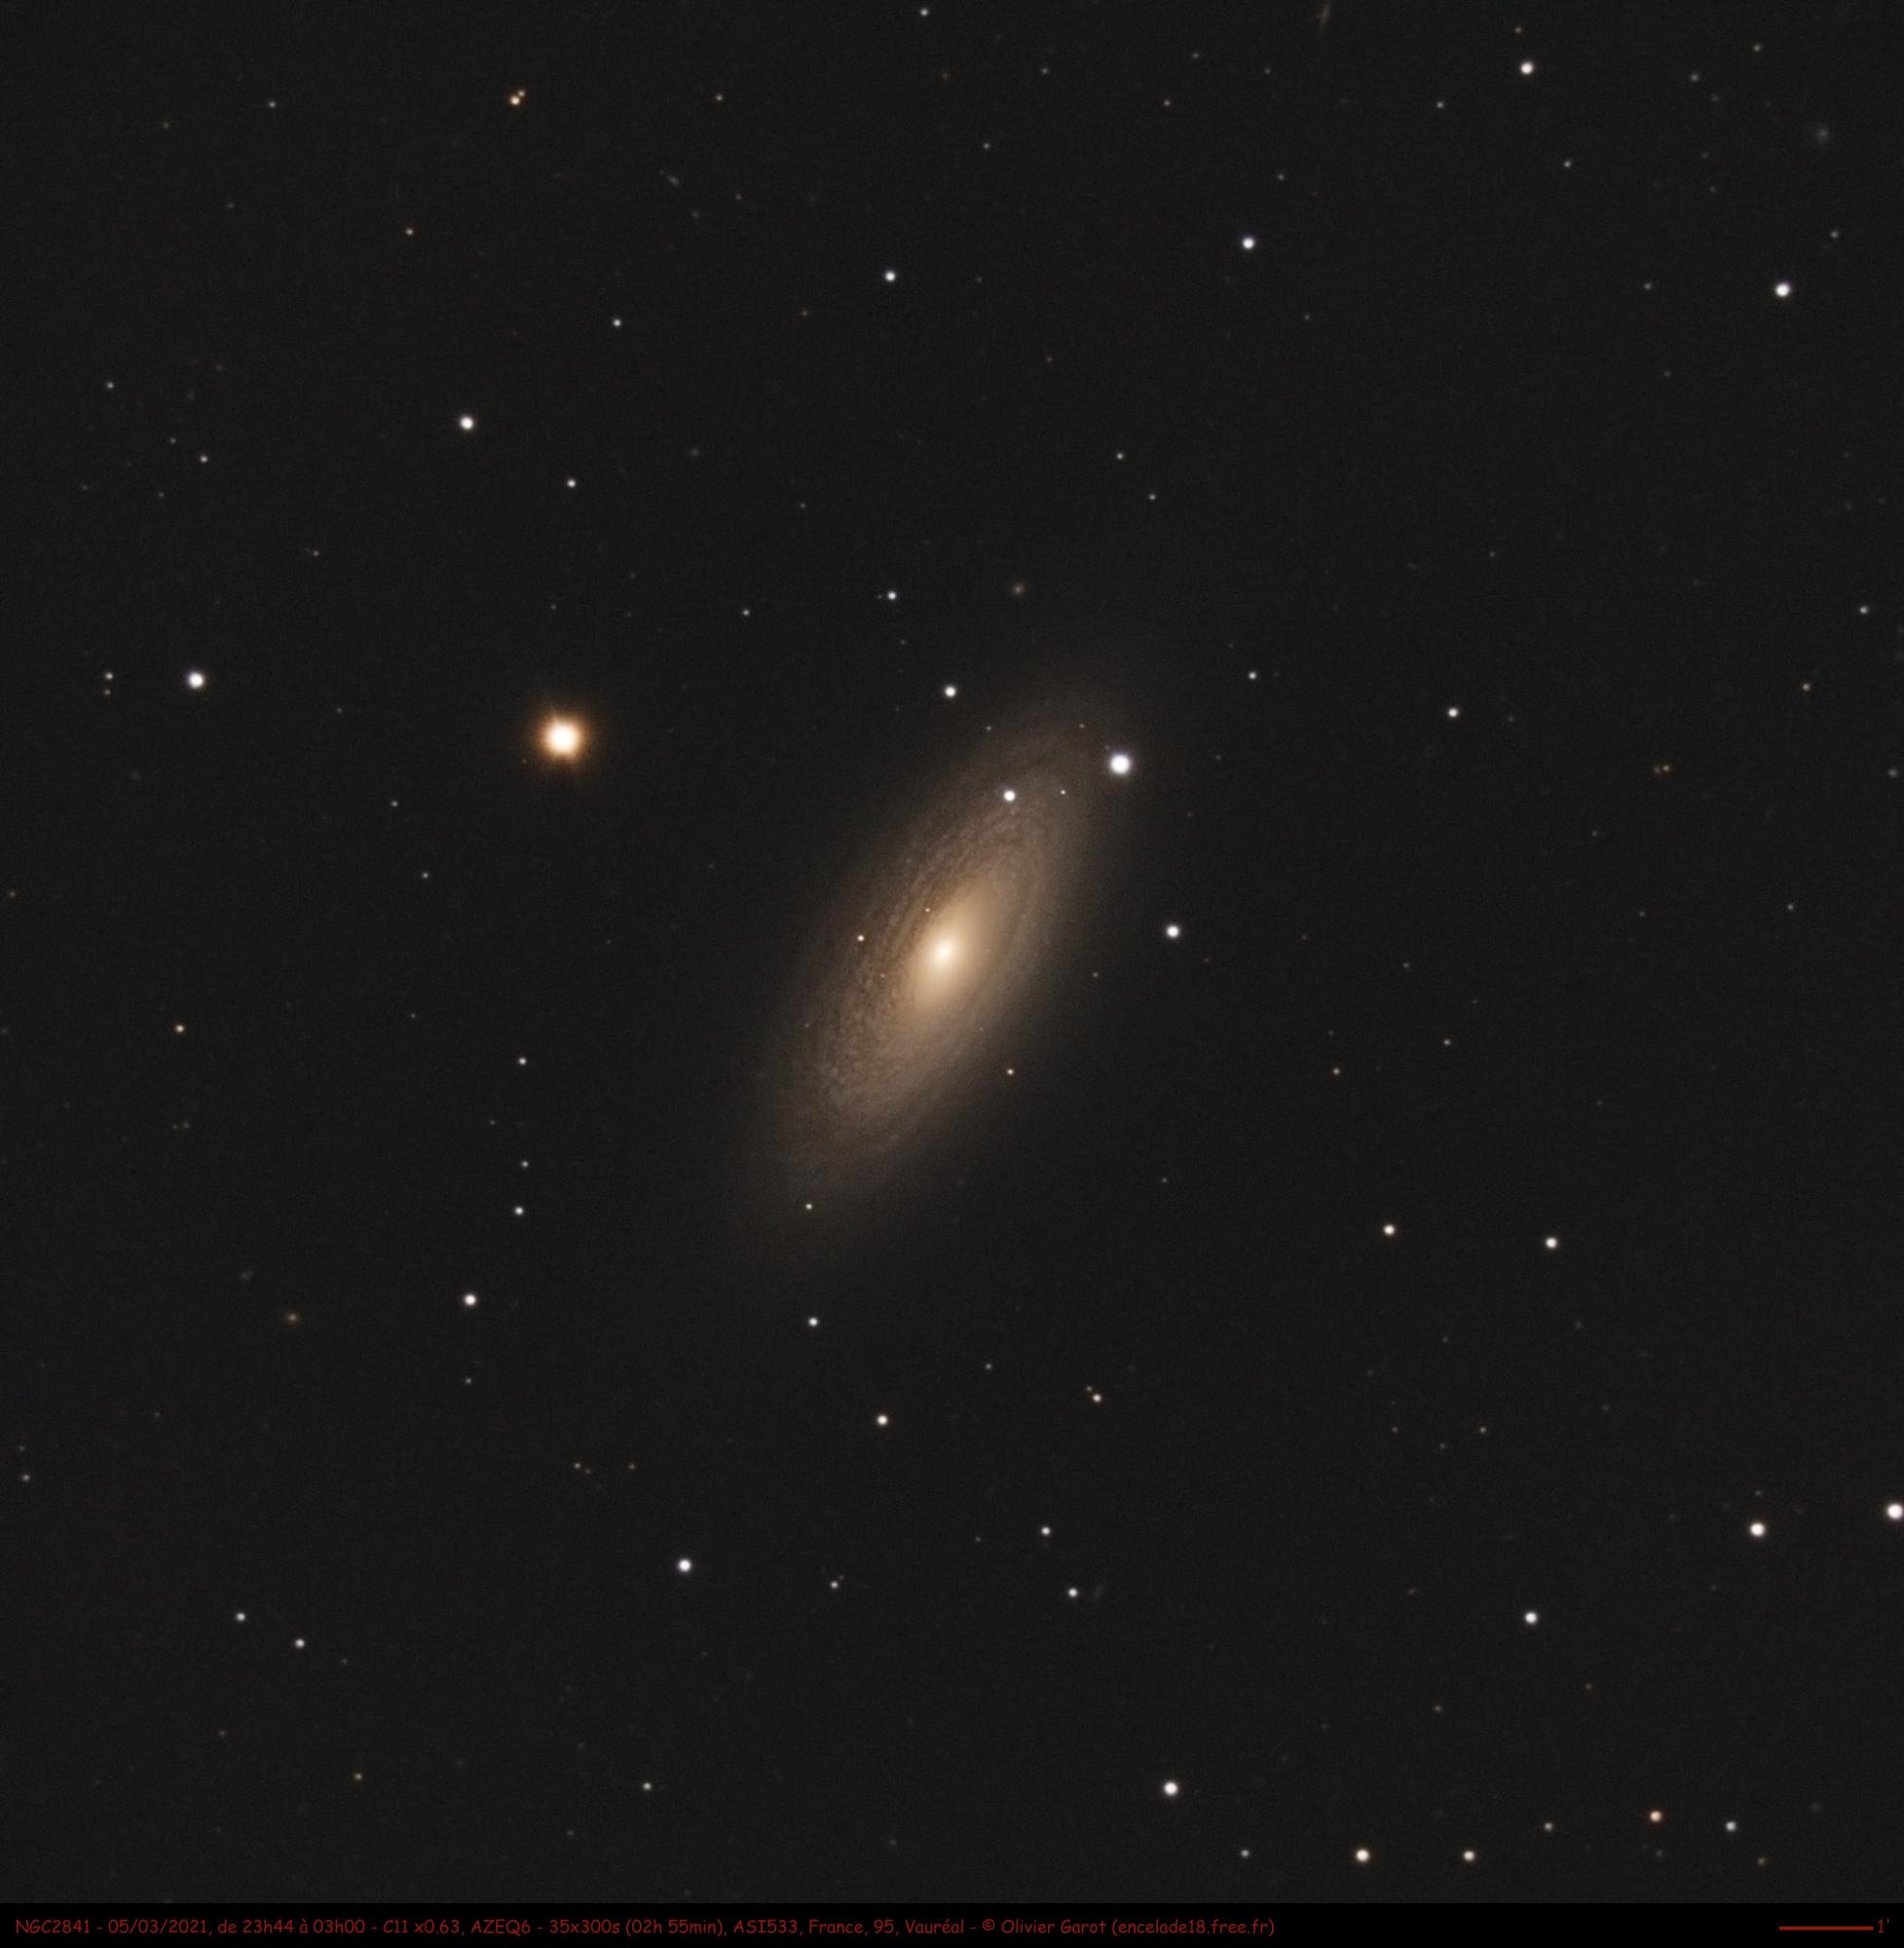 NGC2841_2021_03_05_SSFW_DOF_35im300s_csr_eG_ecp_th0_tftc1_sat_niv_MFth0_MFd_RB_nivGA_sats_MFb_niv_og.thumb.jpg.90fcbea0505d325c039137e3c34477ef.jpg